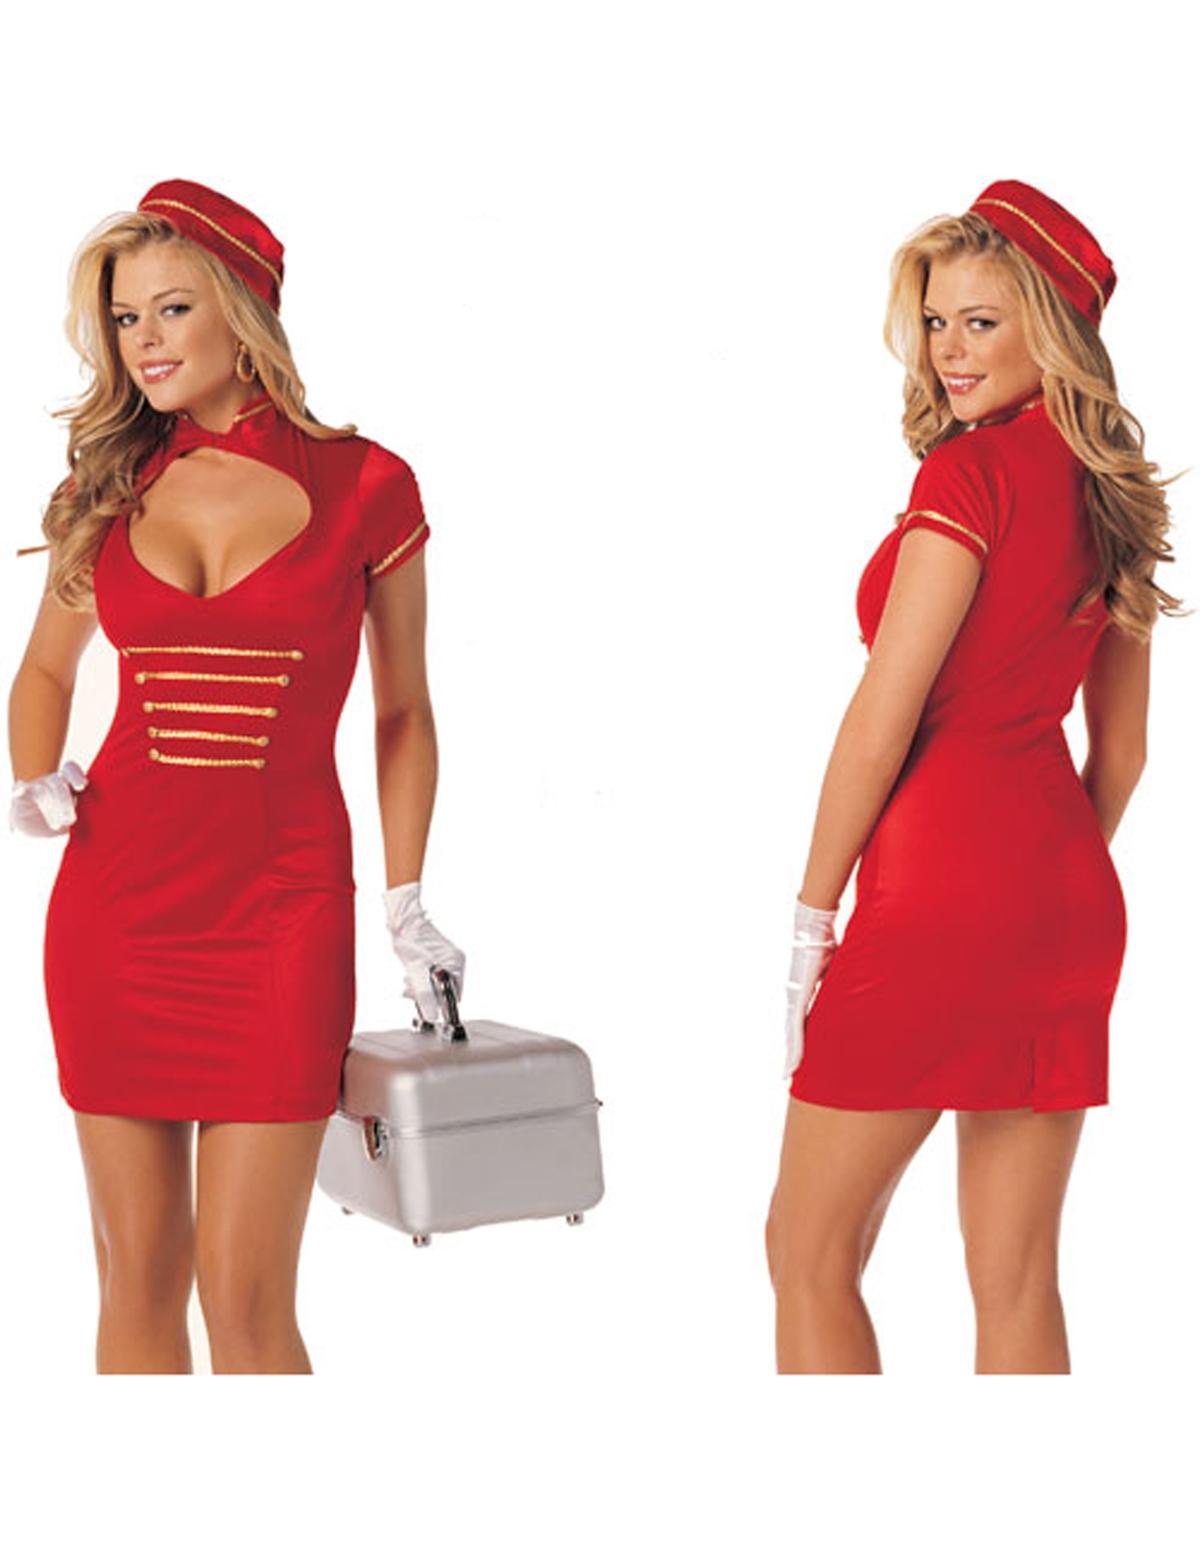 Bell Hop Me Costume